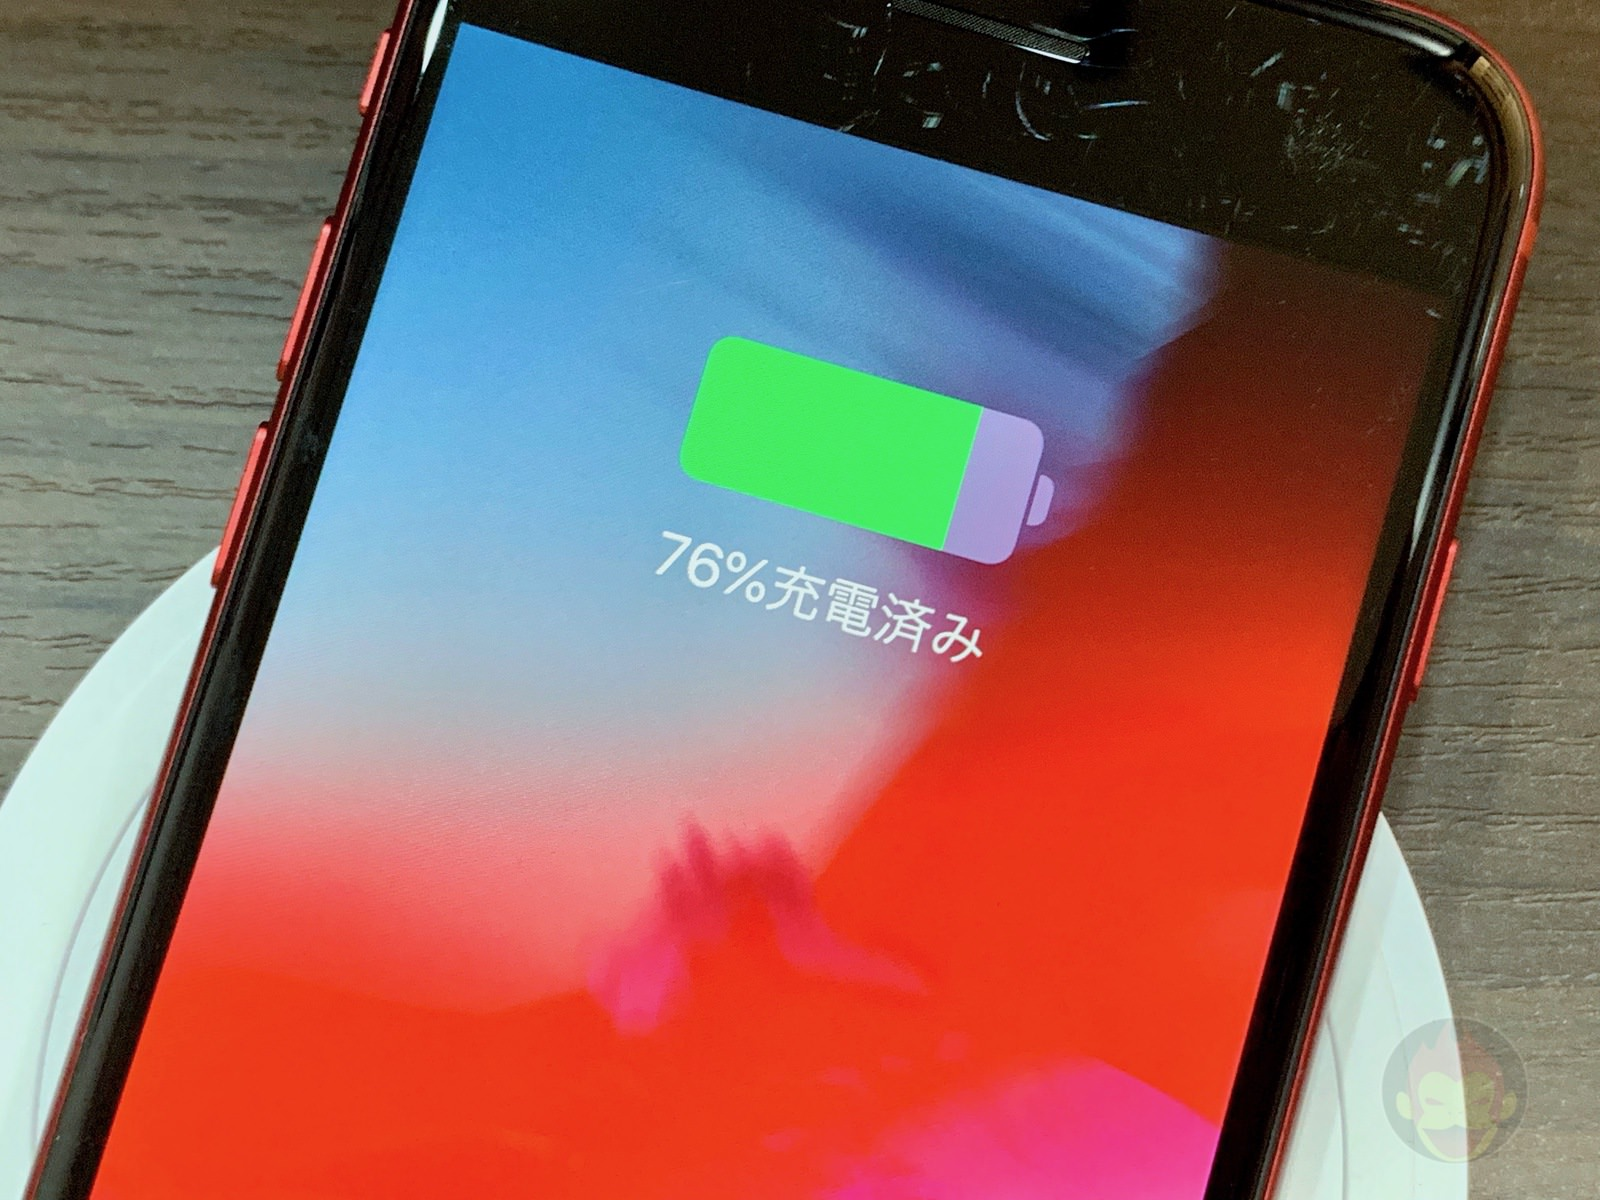 Using-iPhone8-in-2019-02.jpg